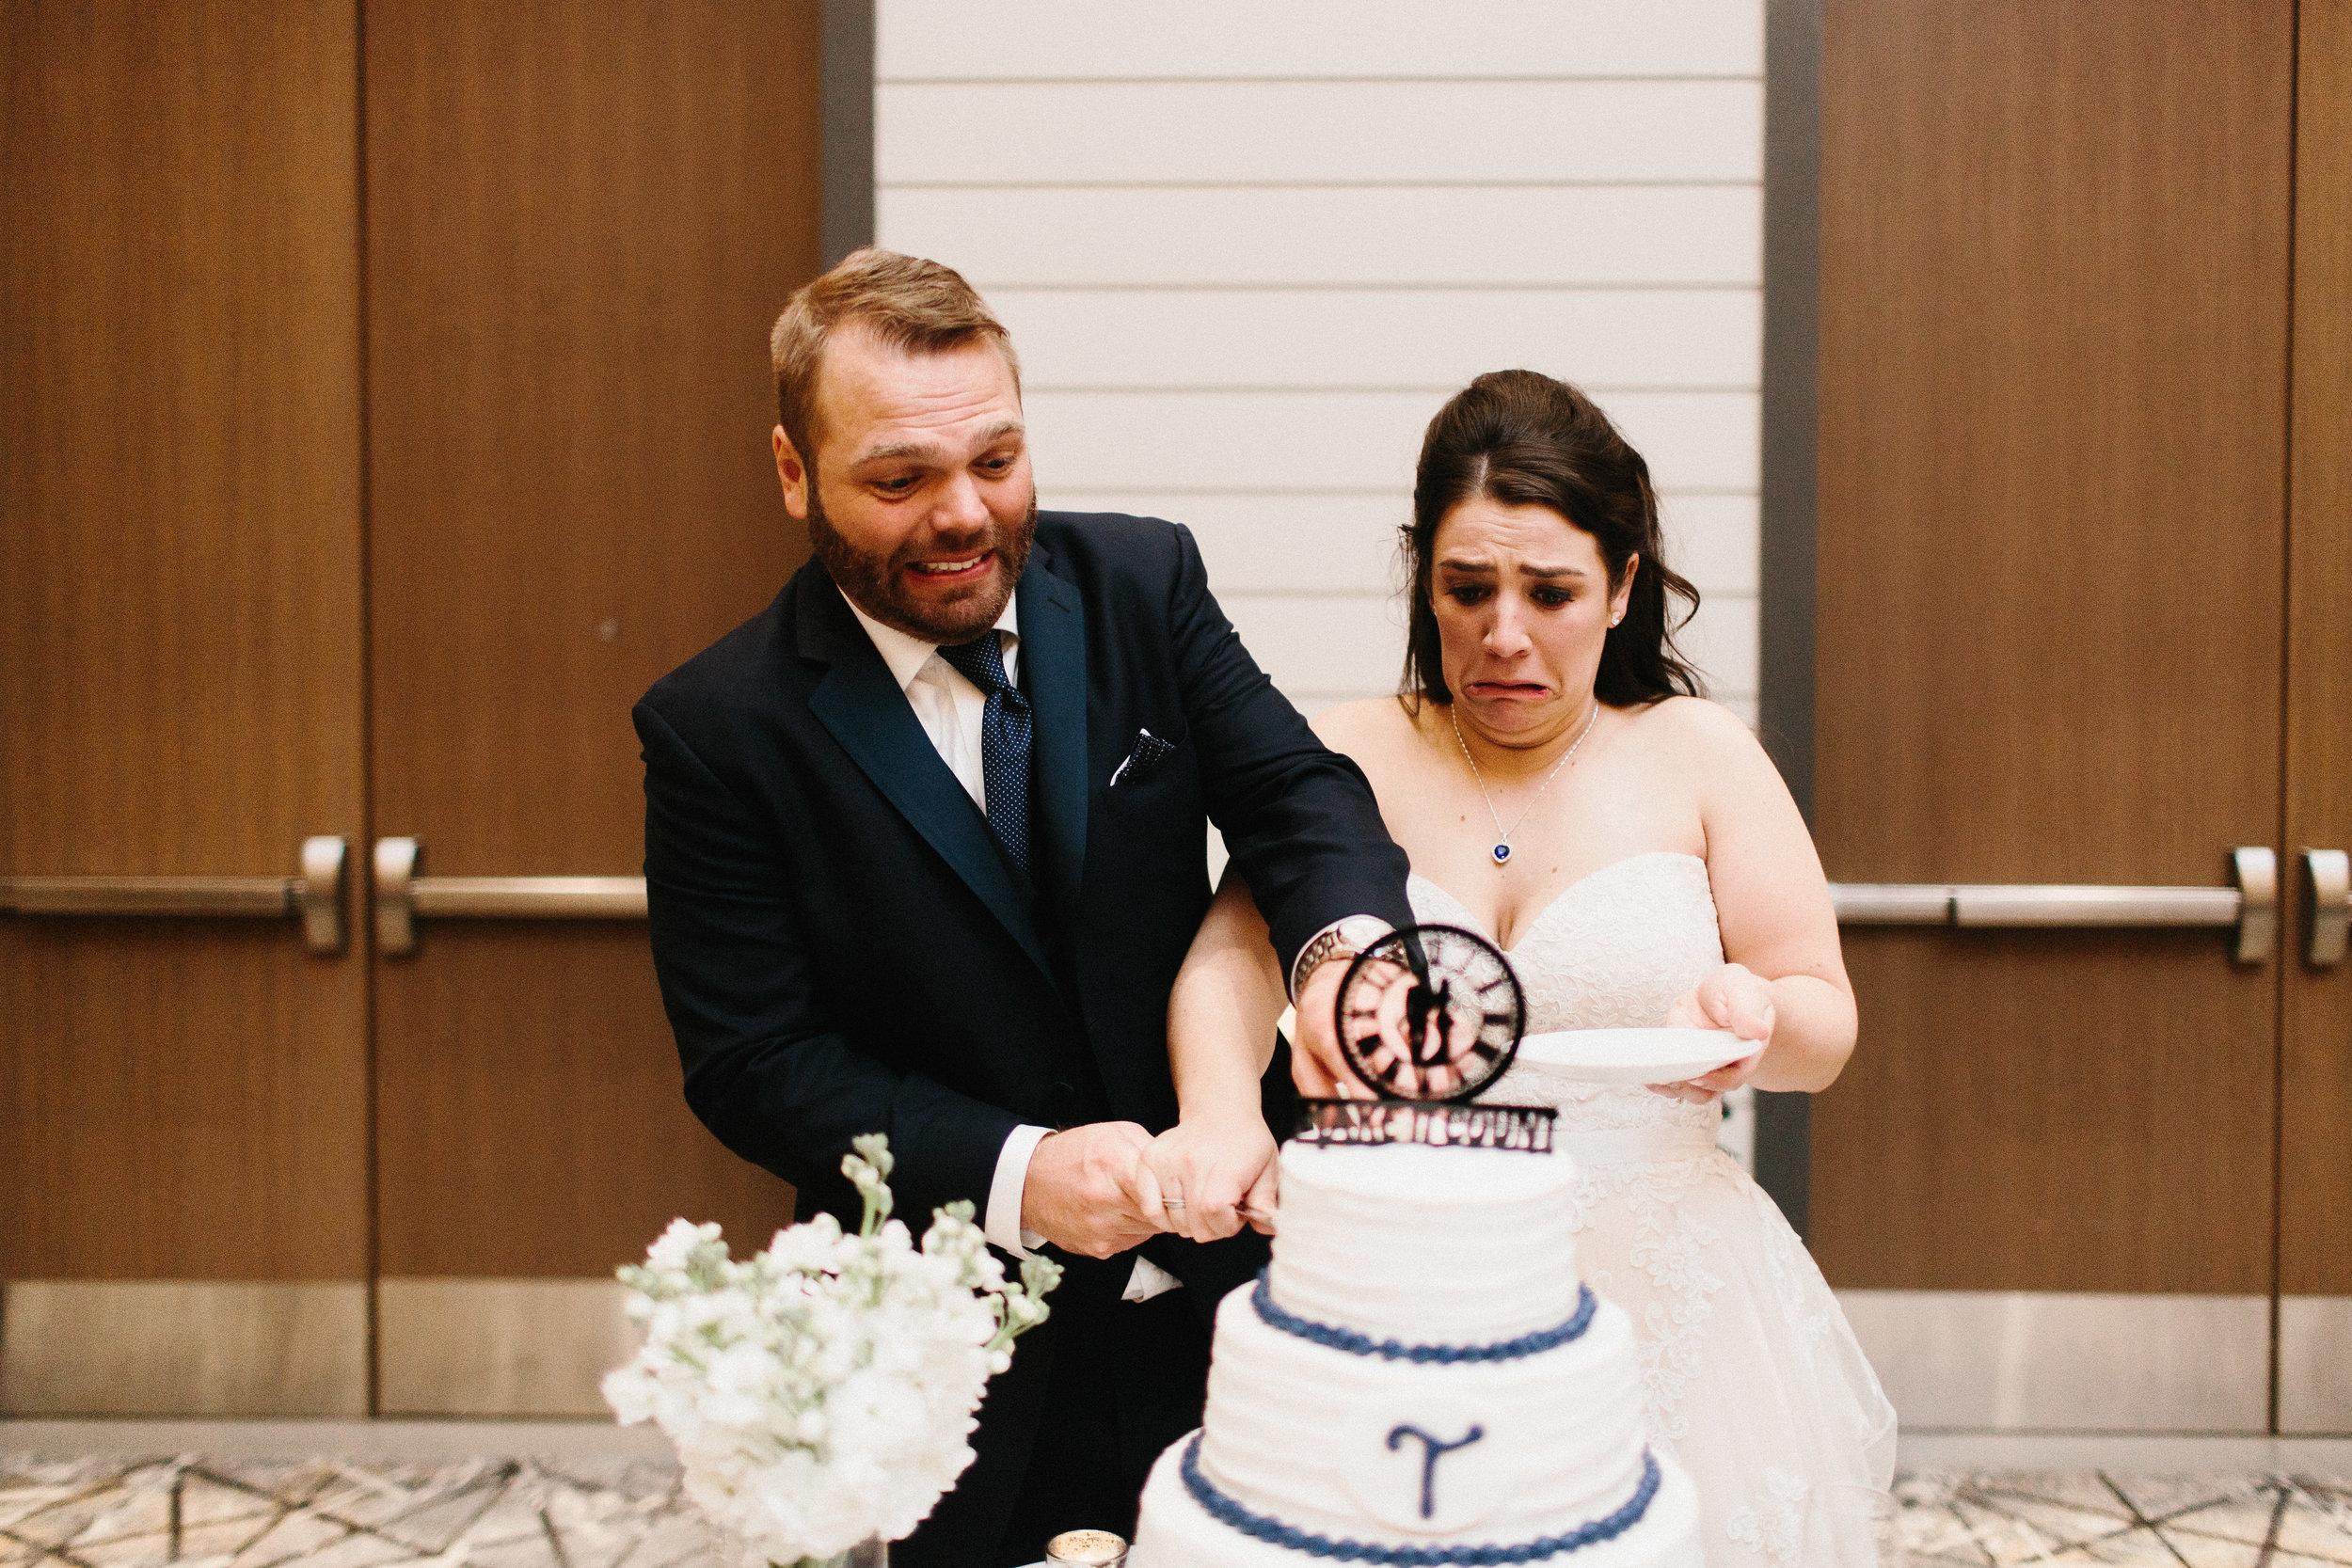 roswell_st_peter_chanel_catholic_avalon_hotel_alpharetta_wedding-2108.jpg